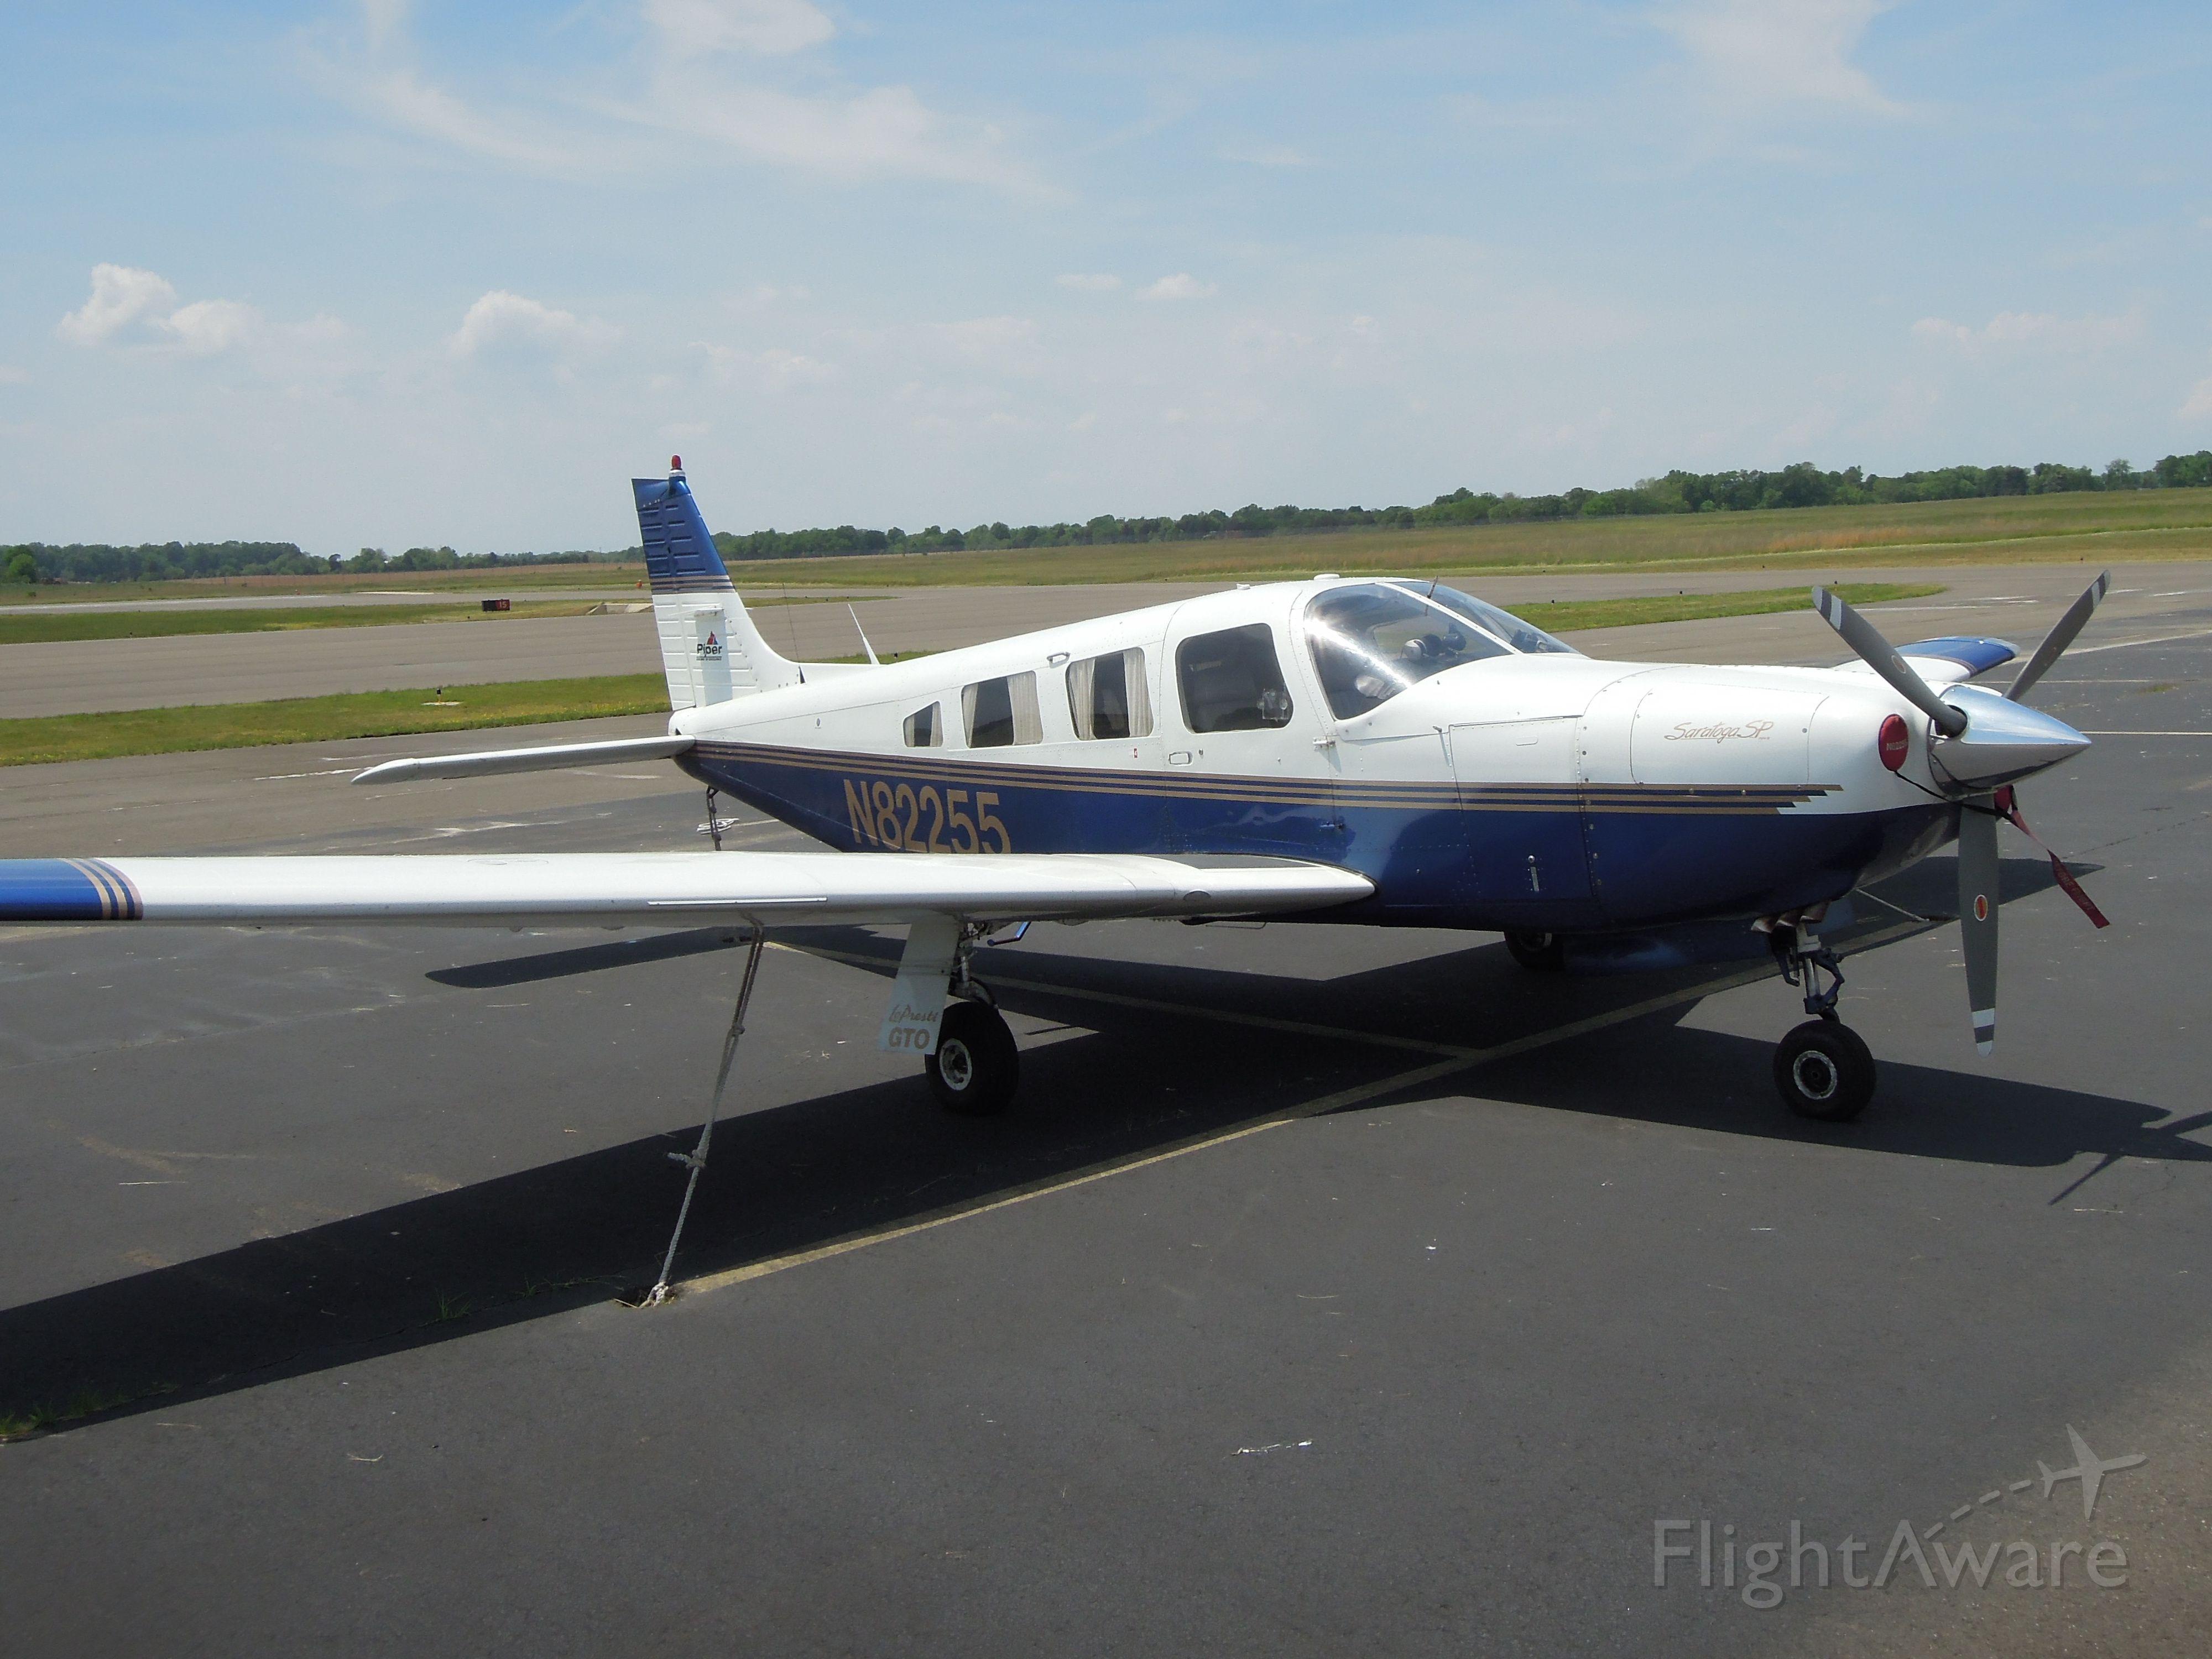 Piper Saratoga (N82255)